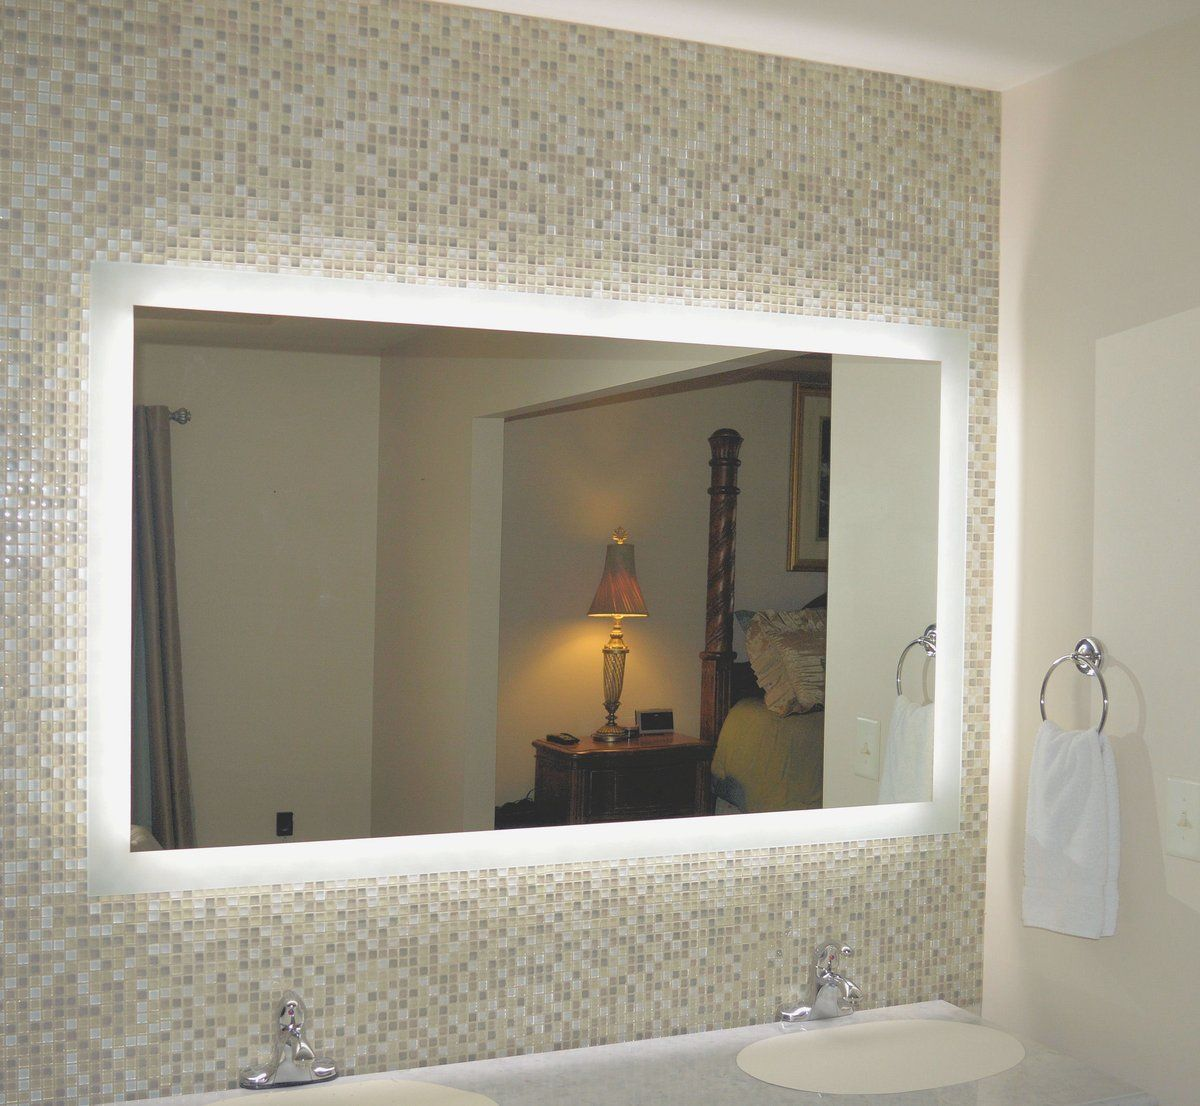 Side Lighted Led Bathroom Vanity Mirror 60 Wide X 40 Tall